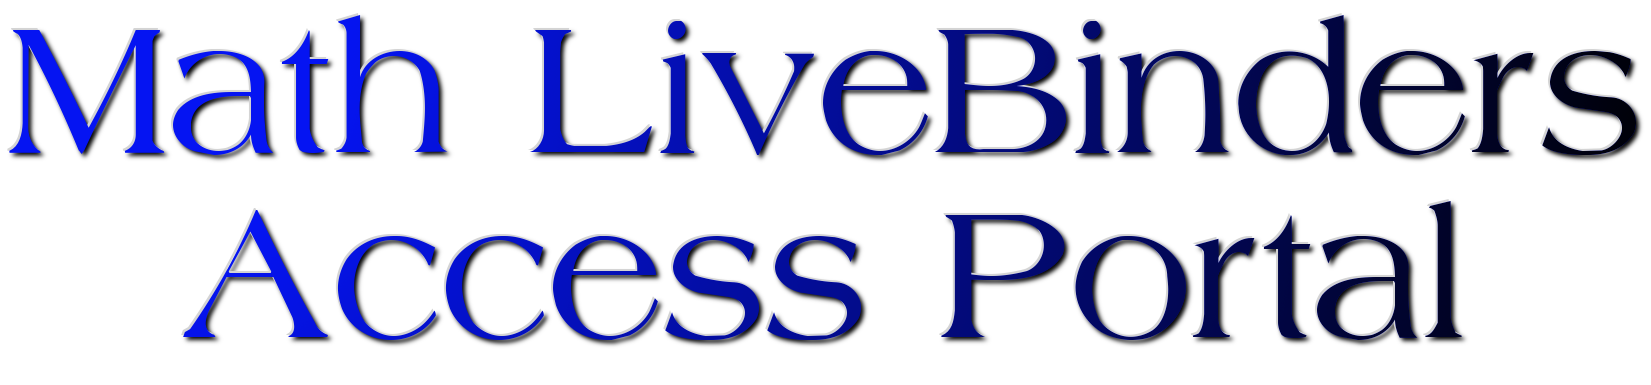 Math LiveBinders Access Portal